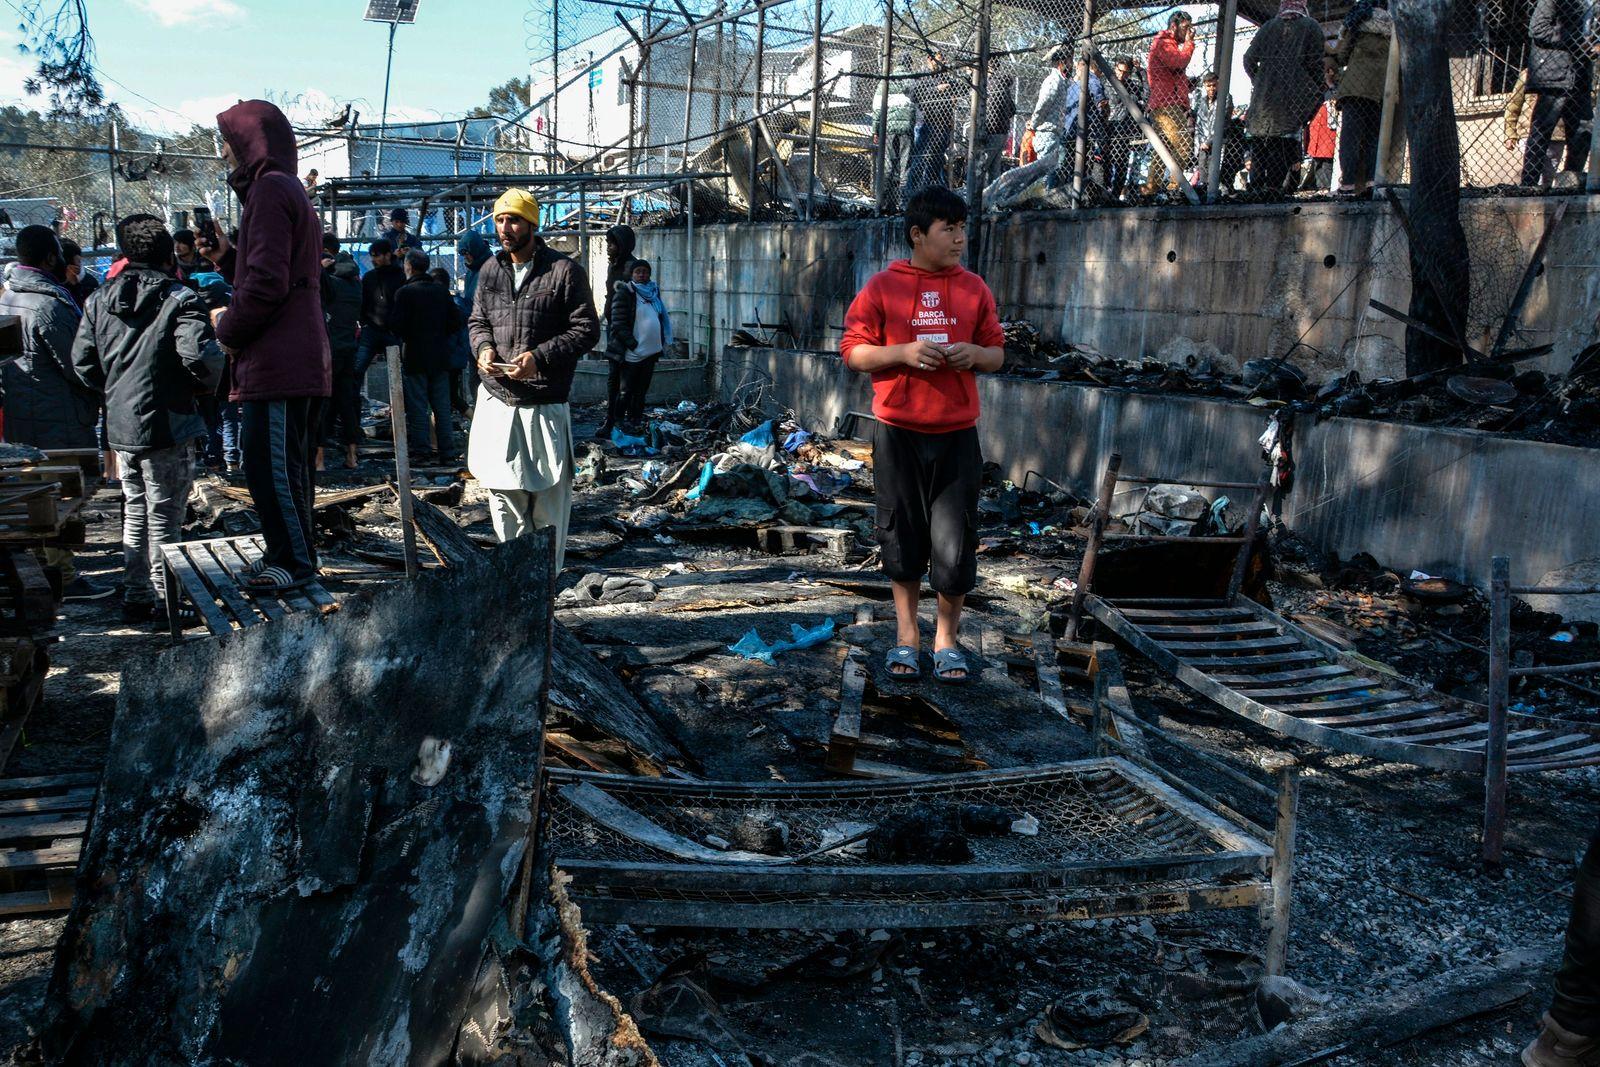 Großer Brand im Flüchtlingslager von Moria